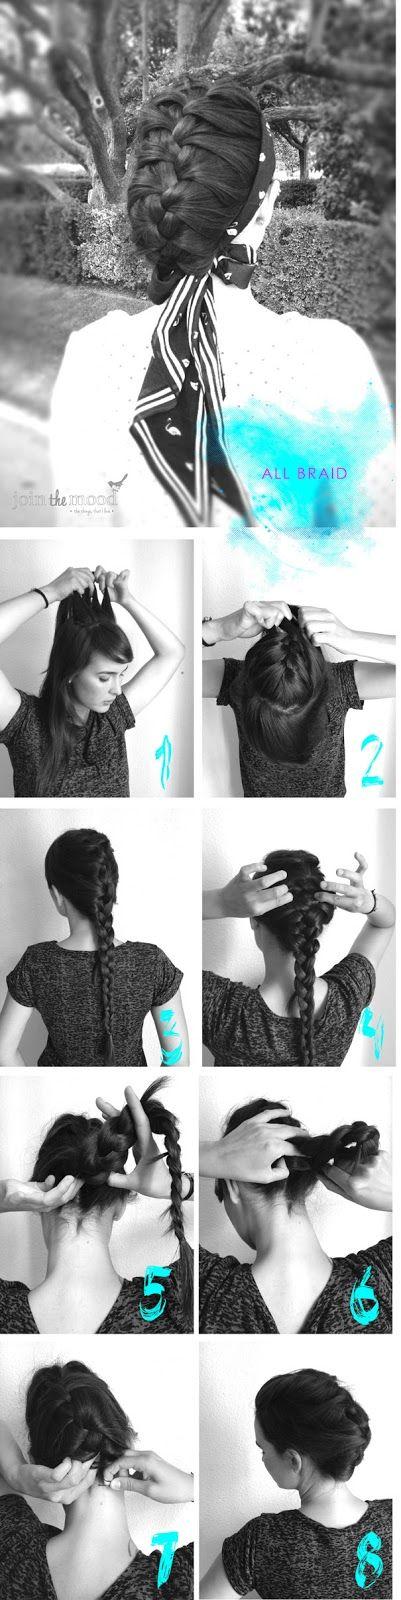 All Braid Hairstyles